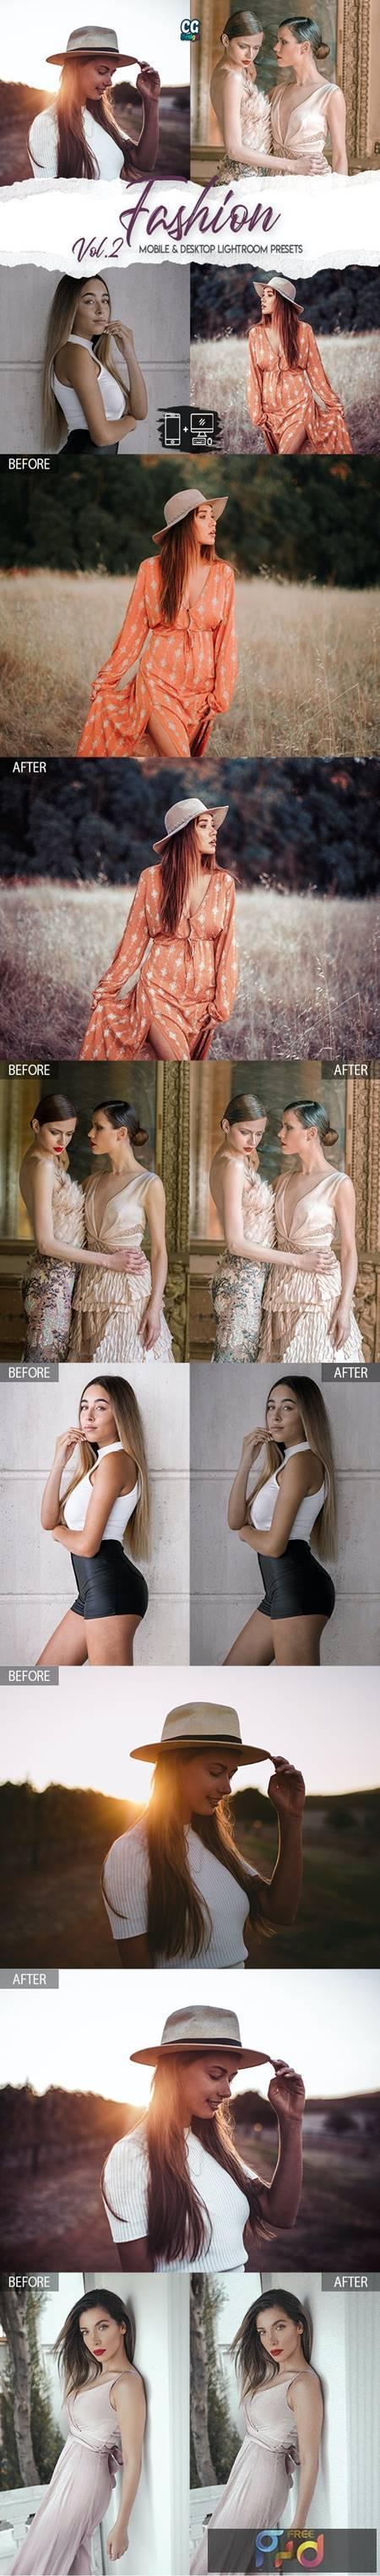 Fashion Lightroom Presets Vol. 2 27933198 1